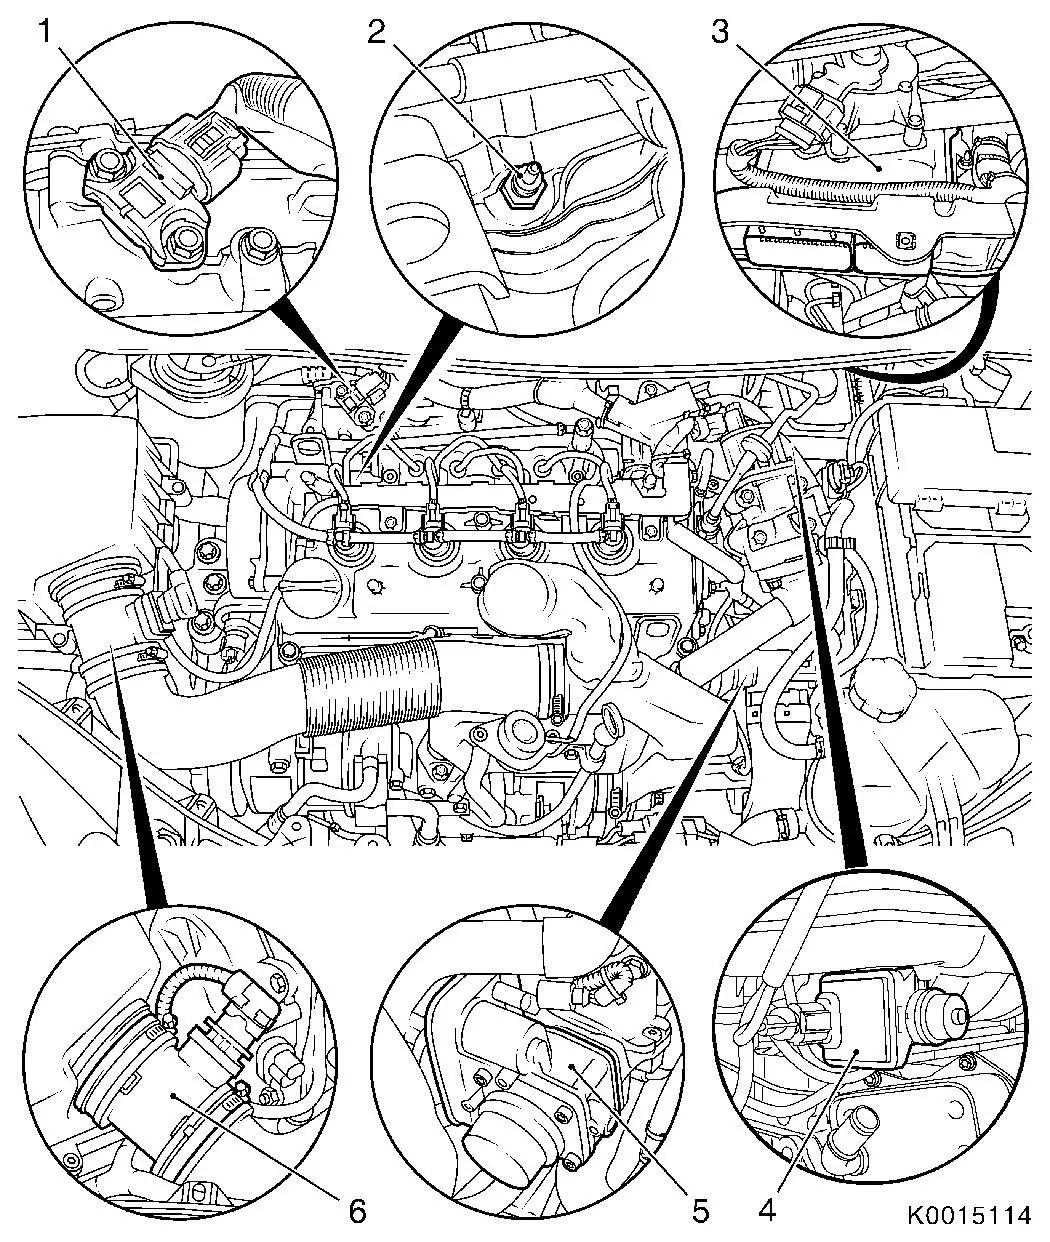 Vauxhall corsa d engine diagram